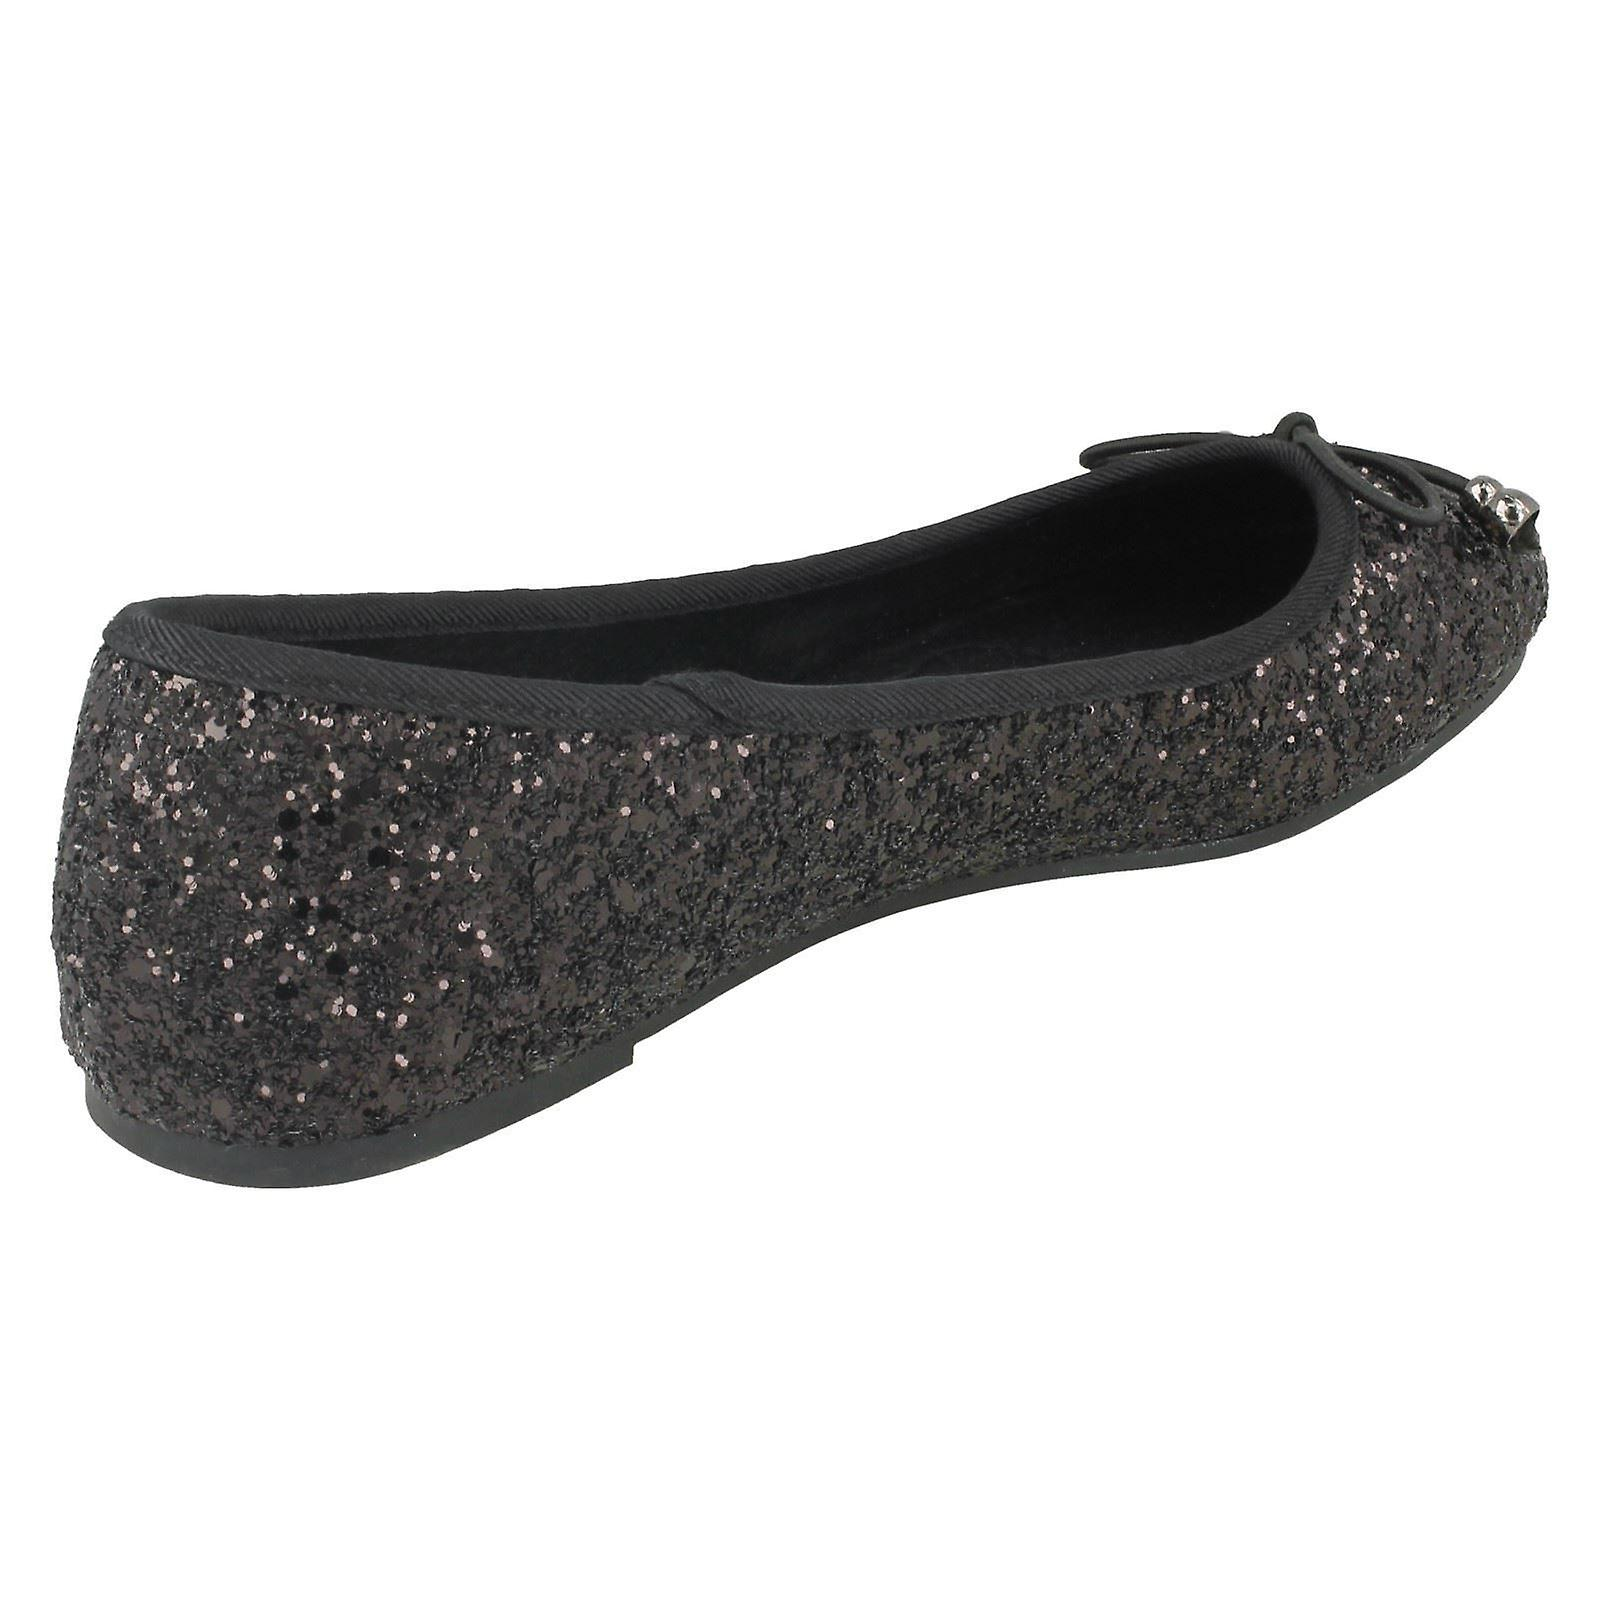 Ballerinas Ladies Glitter Spot F80322 On q44SAz7v1